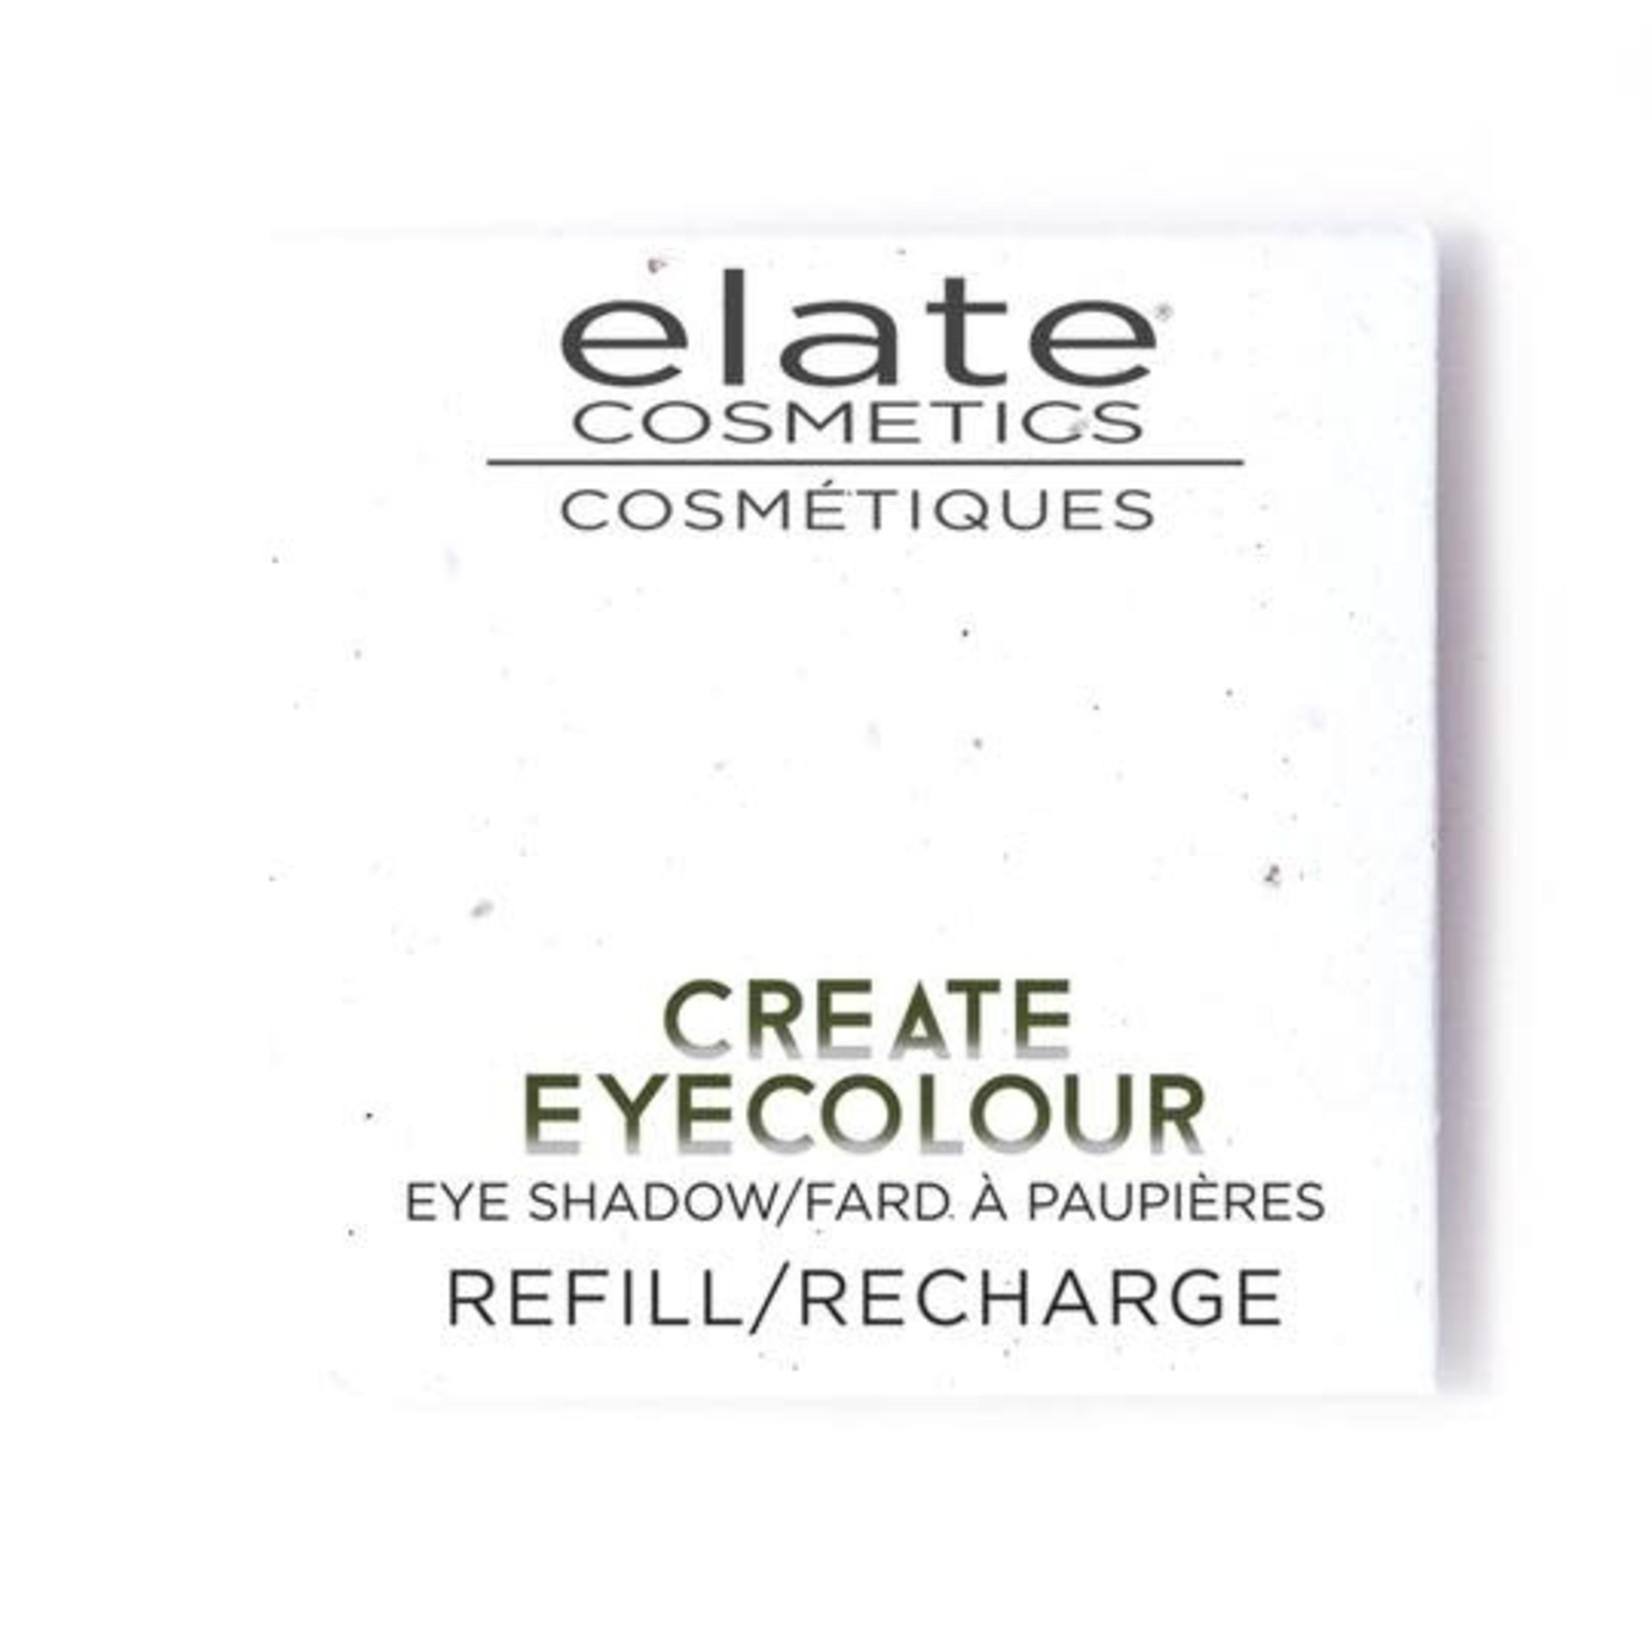 ELATE COSMETICS PRESSED EYECOLOUR - BELOVED